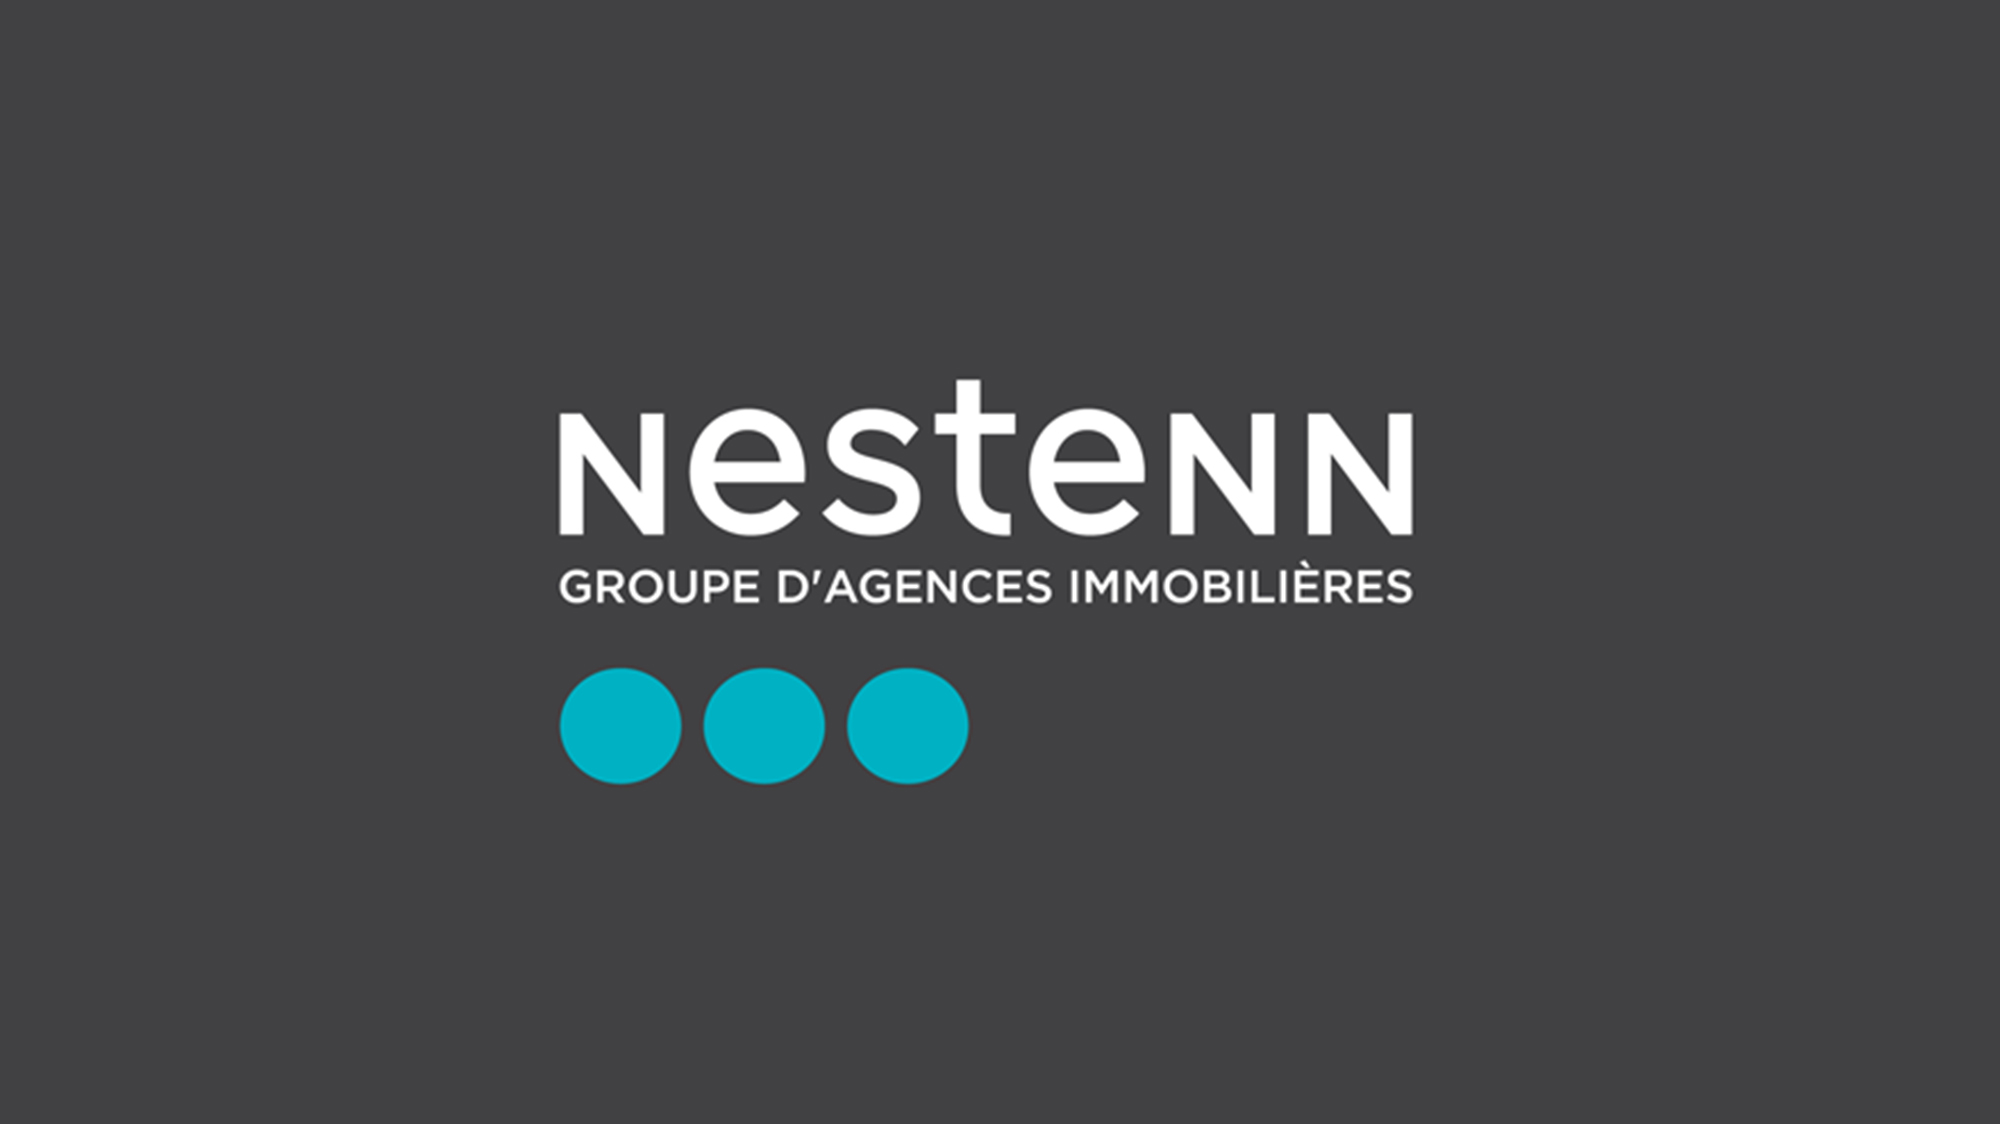 nestenn création de nom de marque agence de naming bénéfik paris trouver un nom de marque